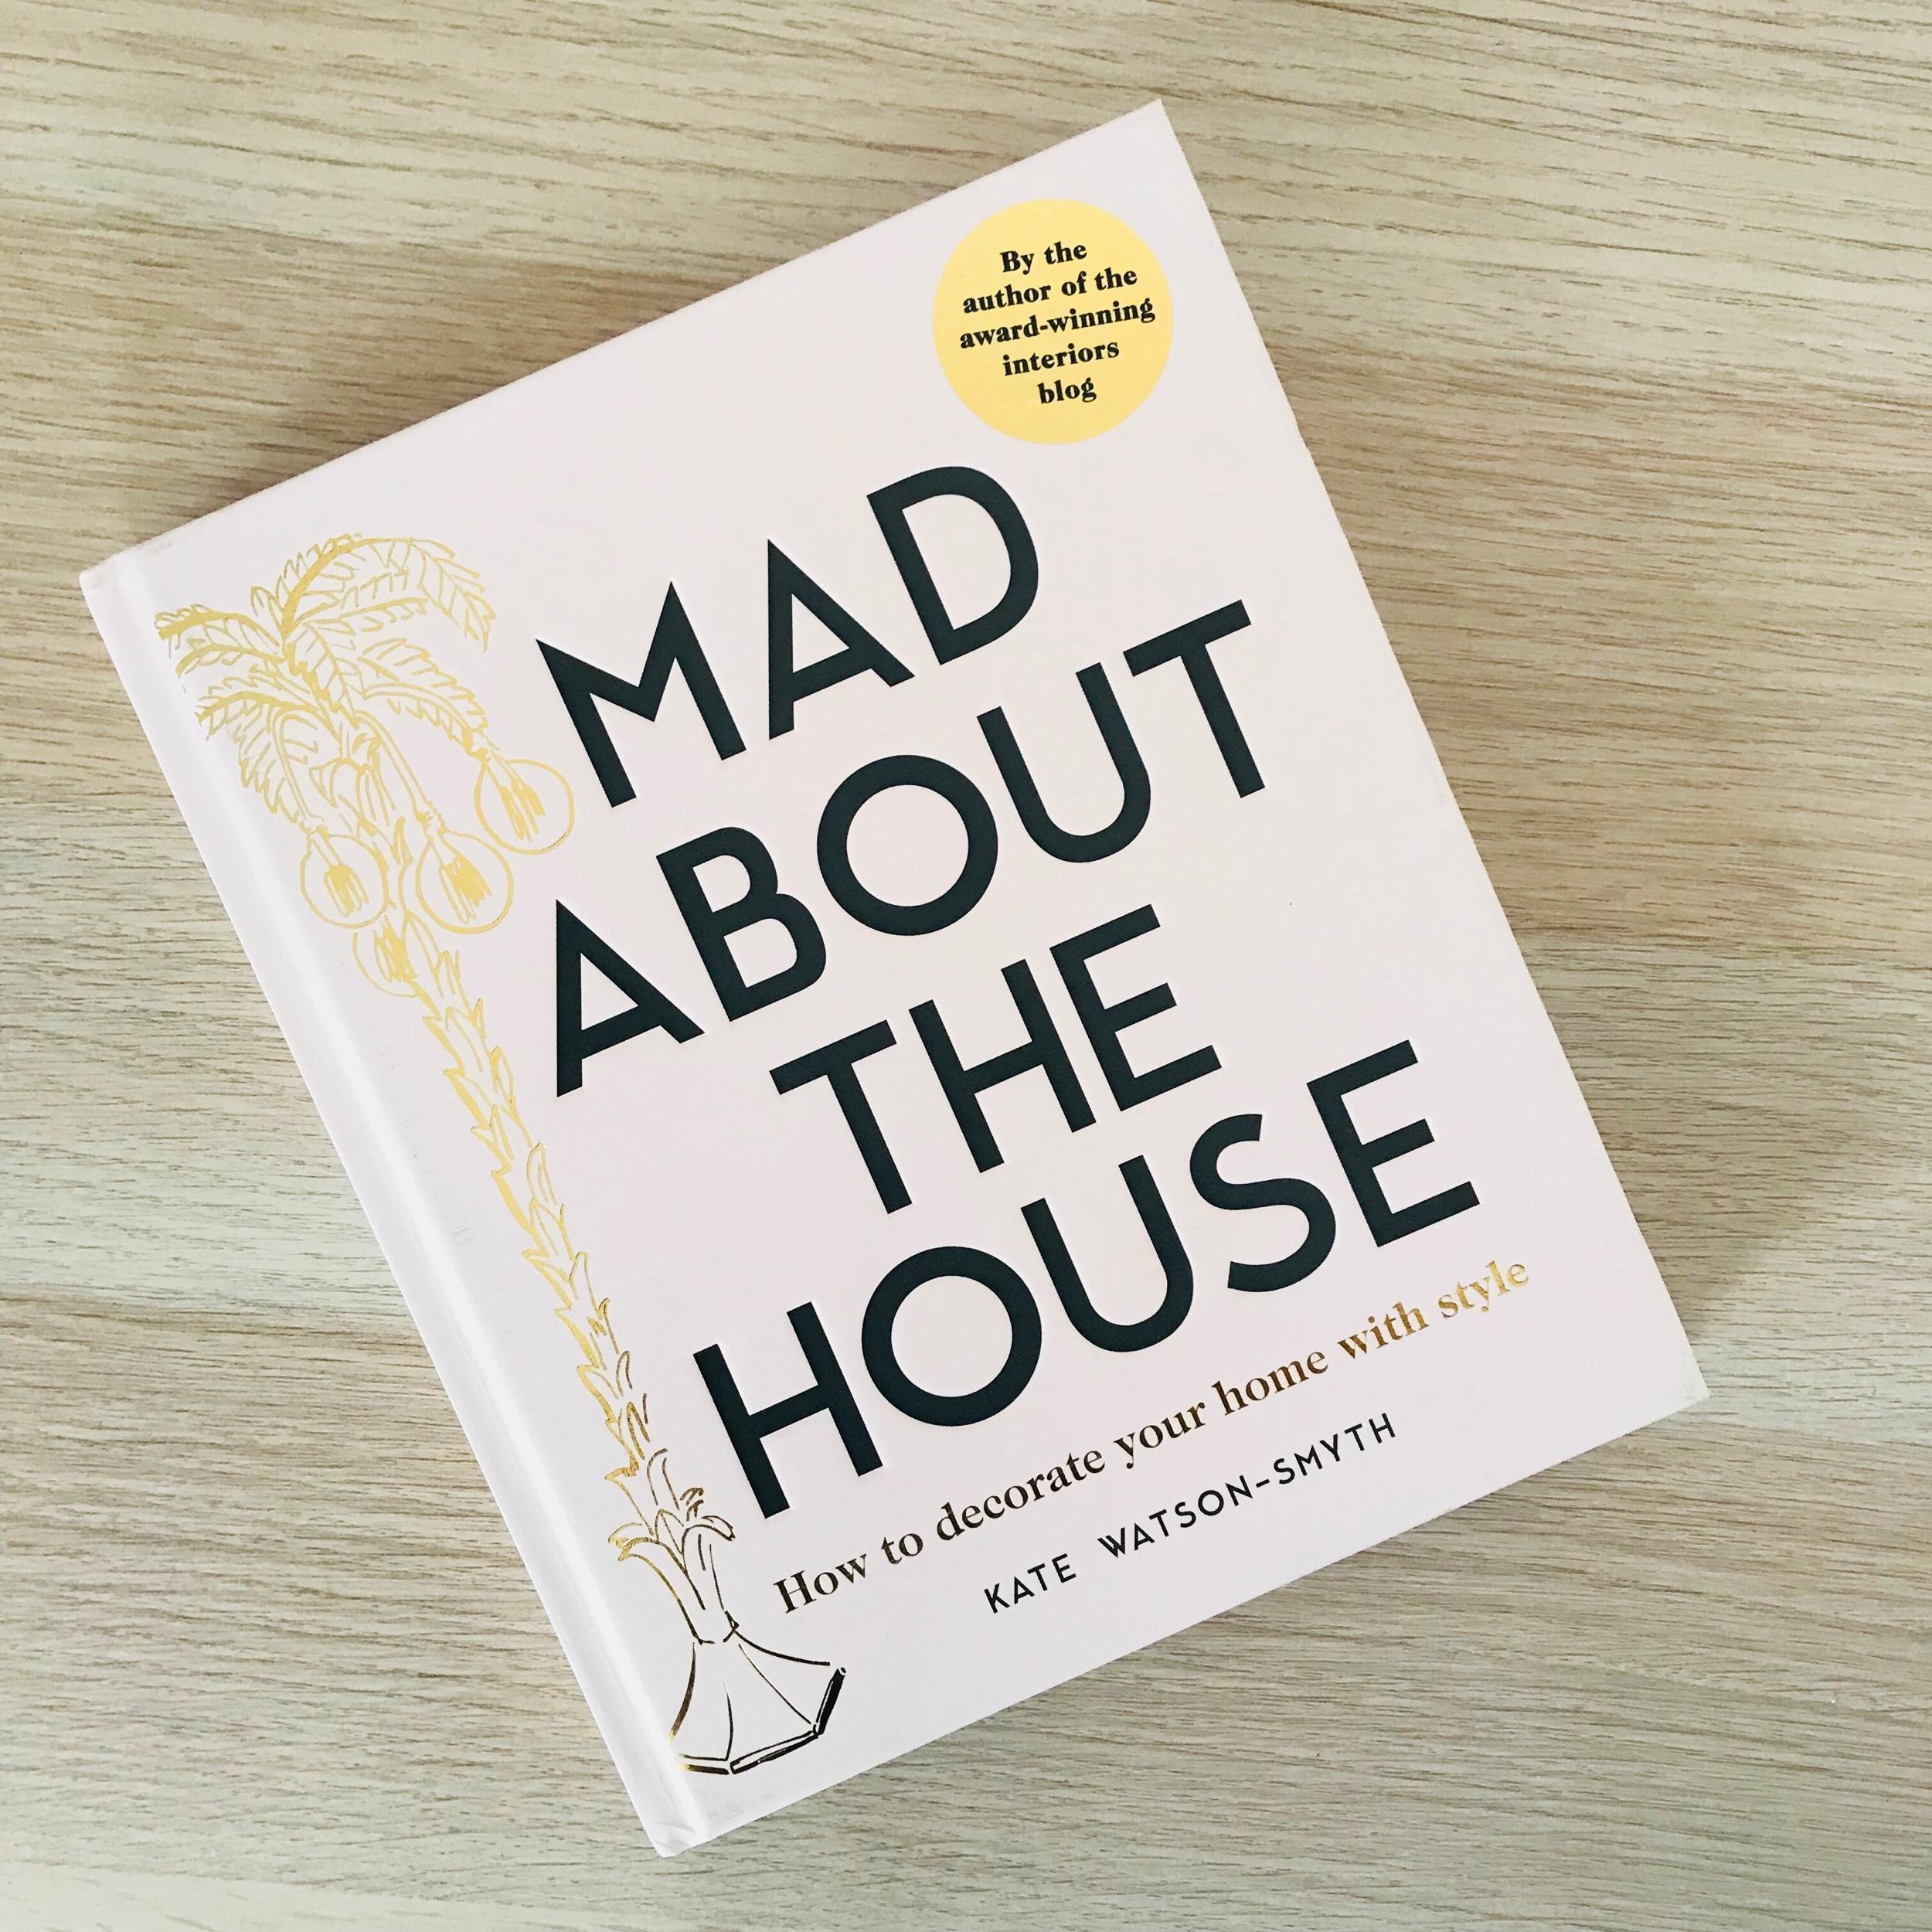 MAD ABOUT THE HOUSEKate Watson-Smyth(Pavilion) -